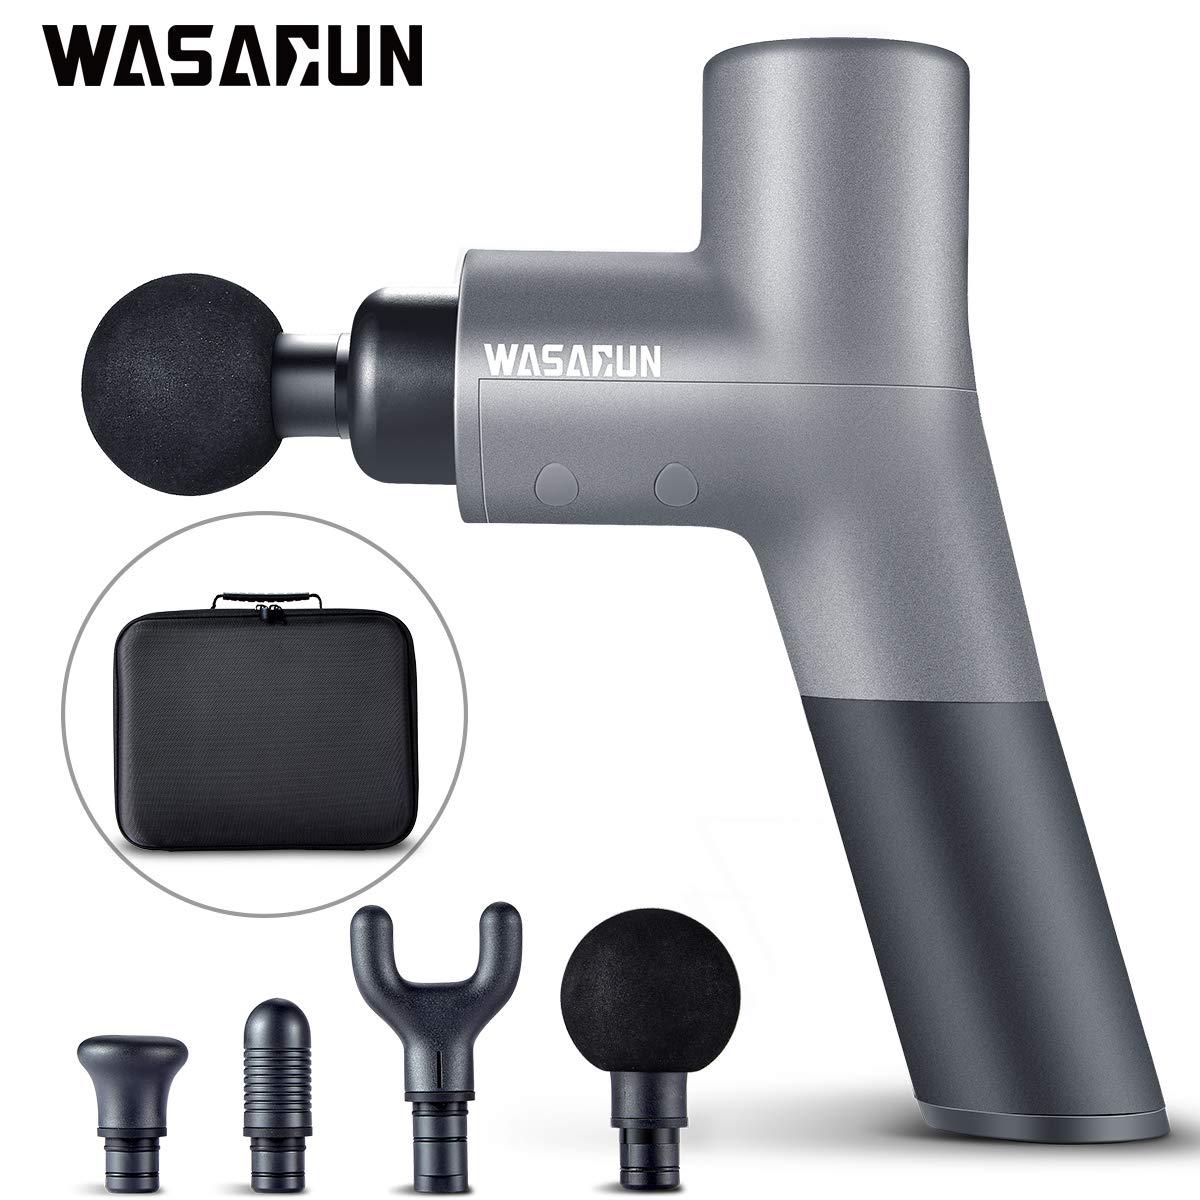 WASAGUN Professional Handheld Vibration Massager